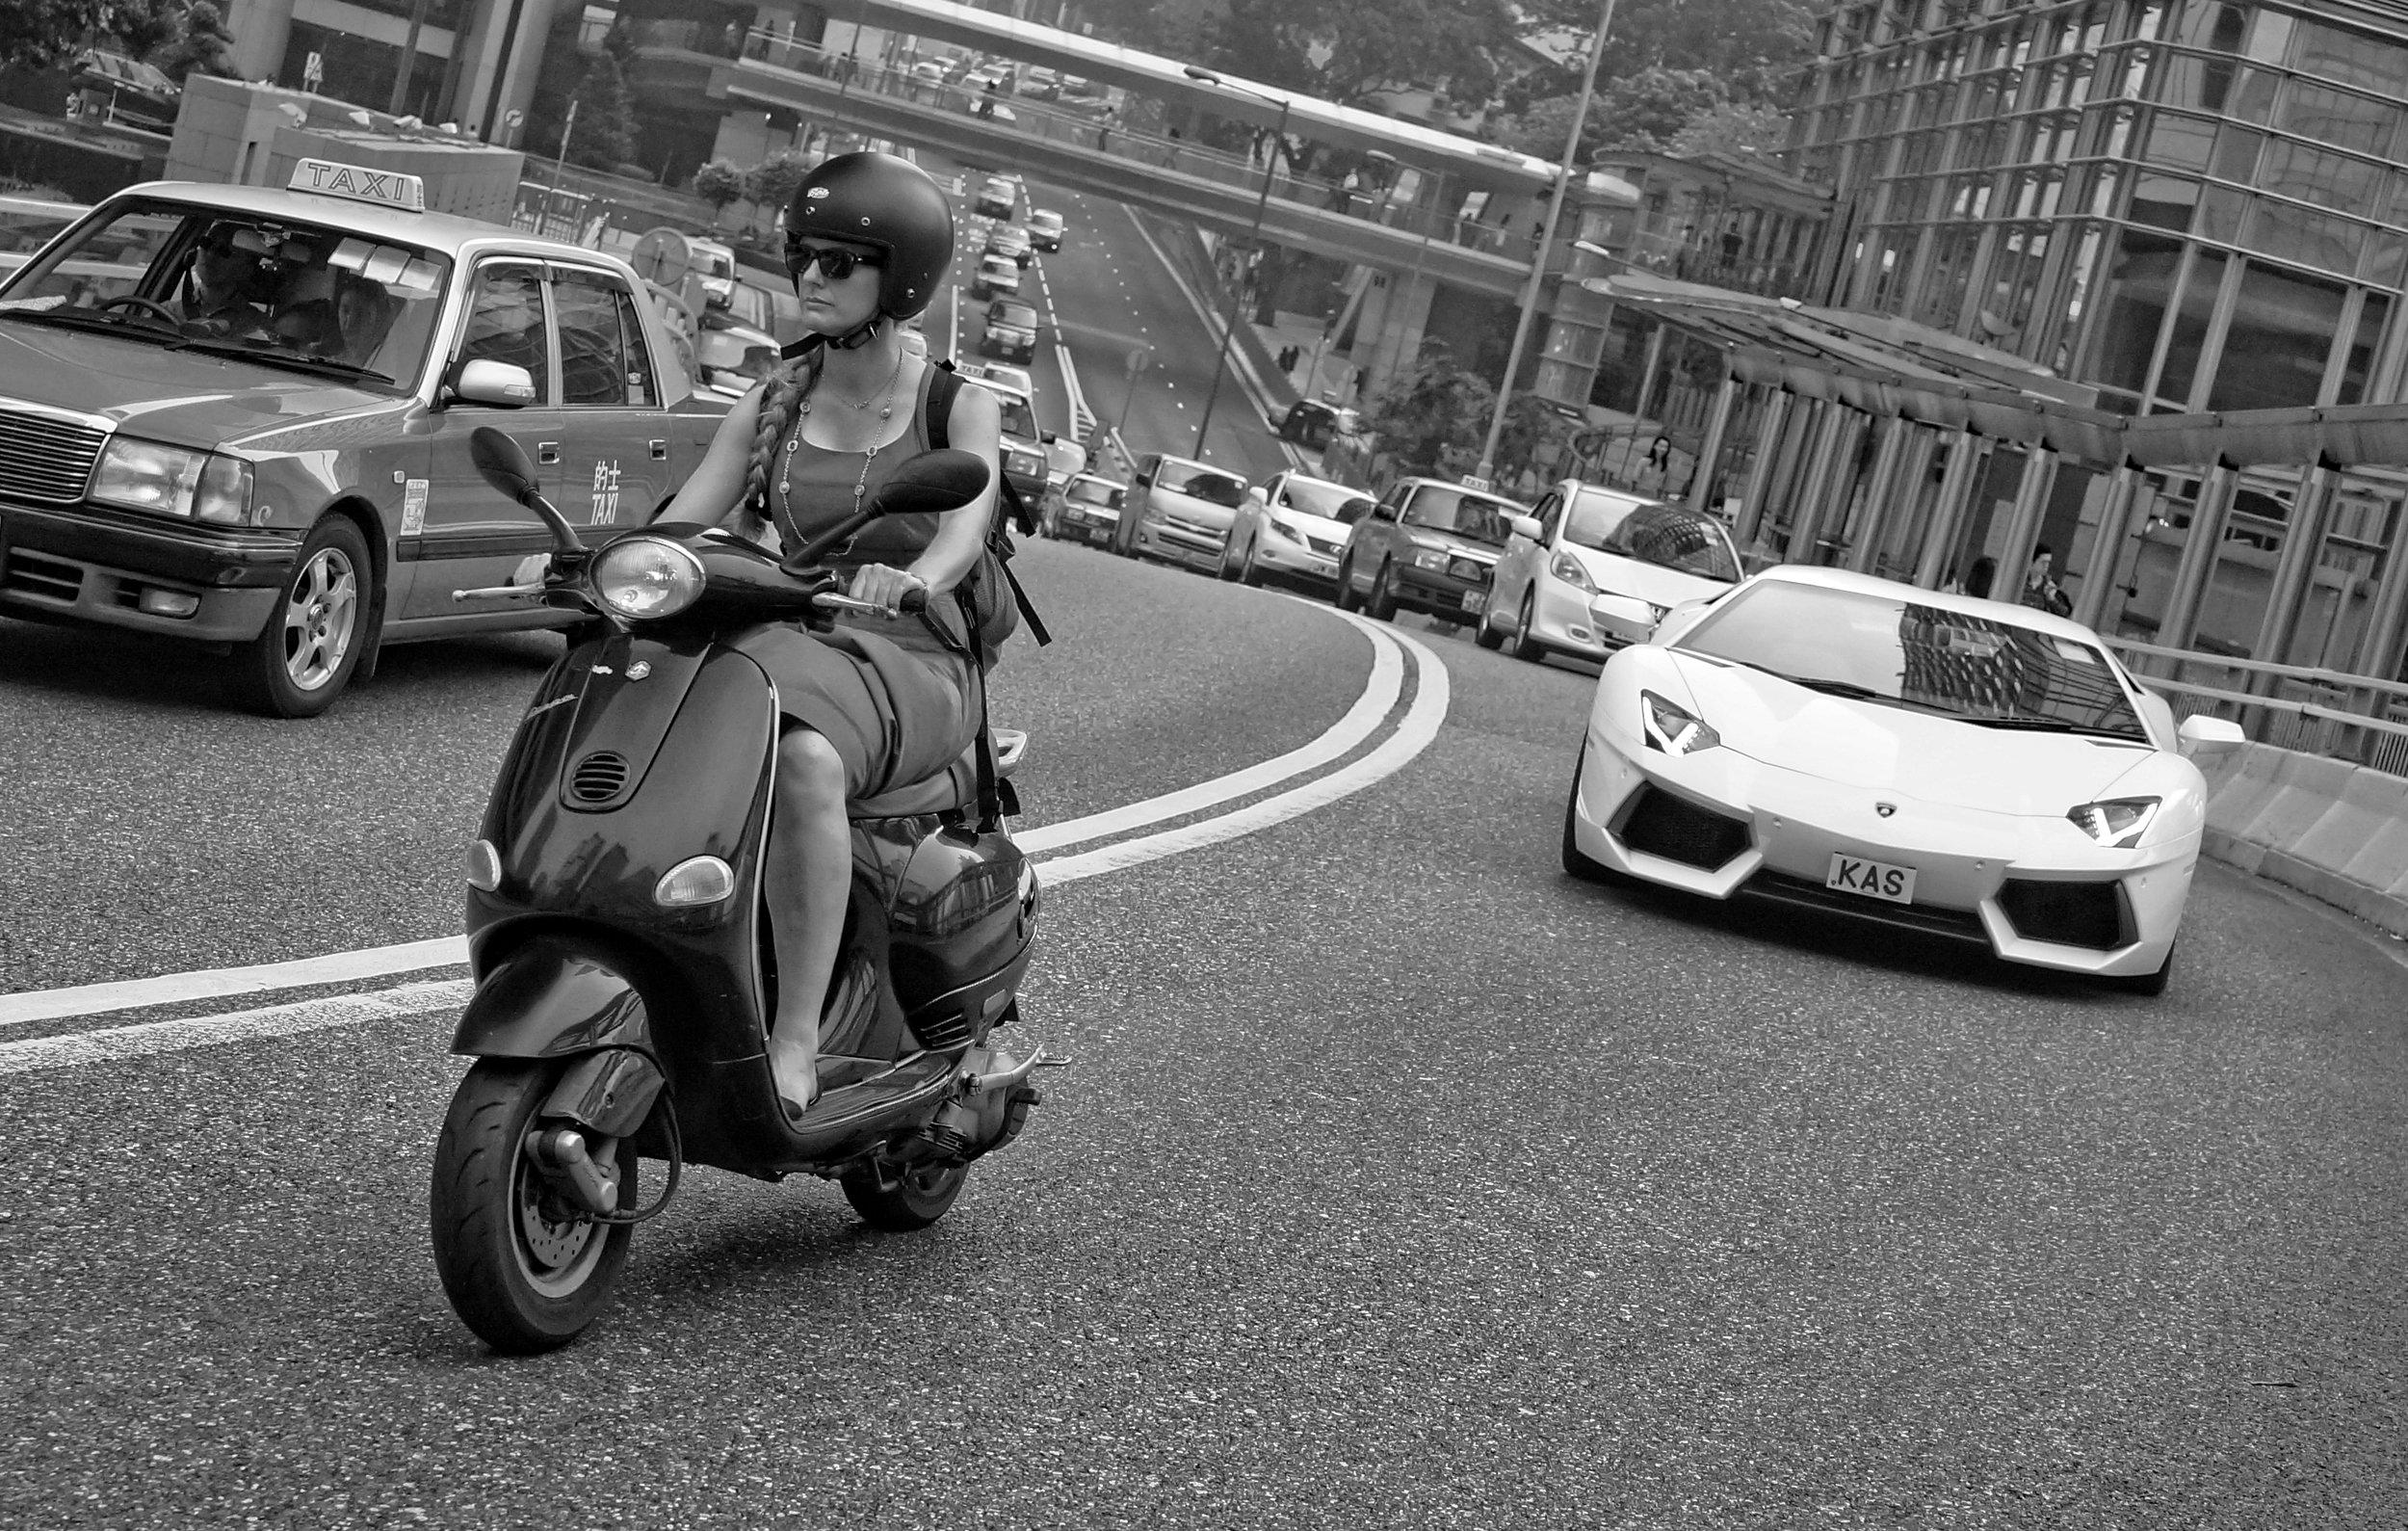 Lady on a scooter vs a chap in a Lamborghini, Garden Road, Hong Kong.jpg